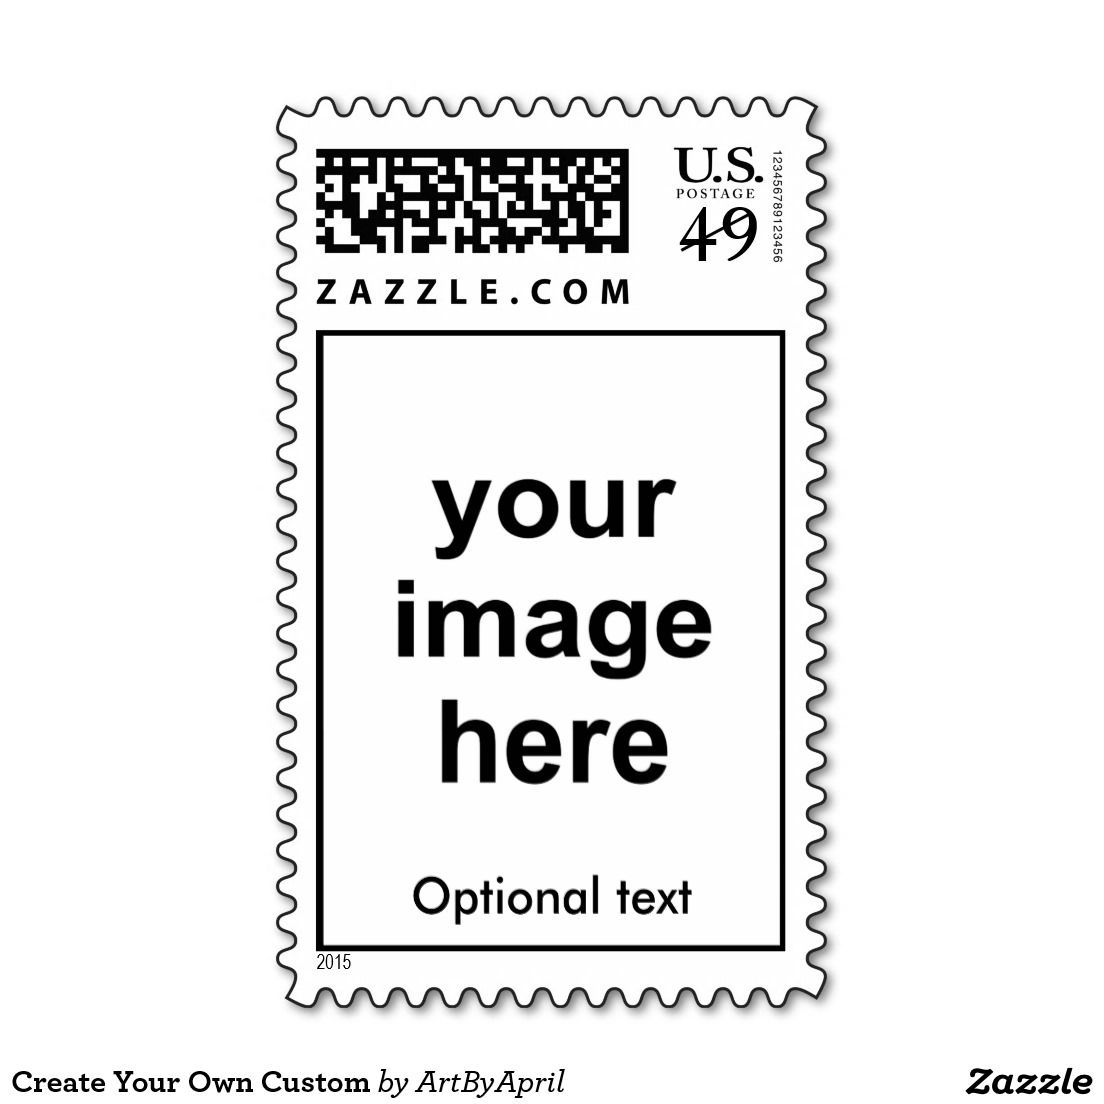 Create your own custom postage custom